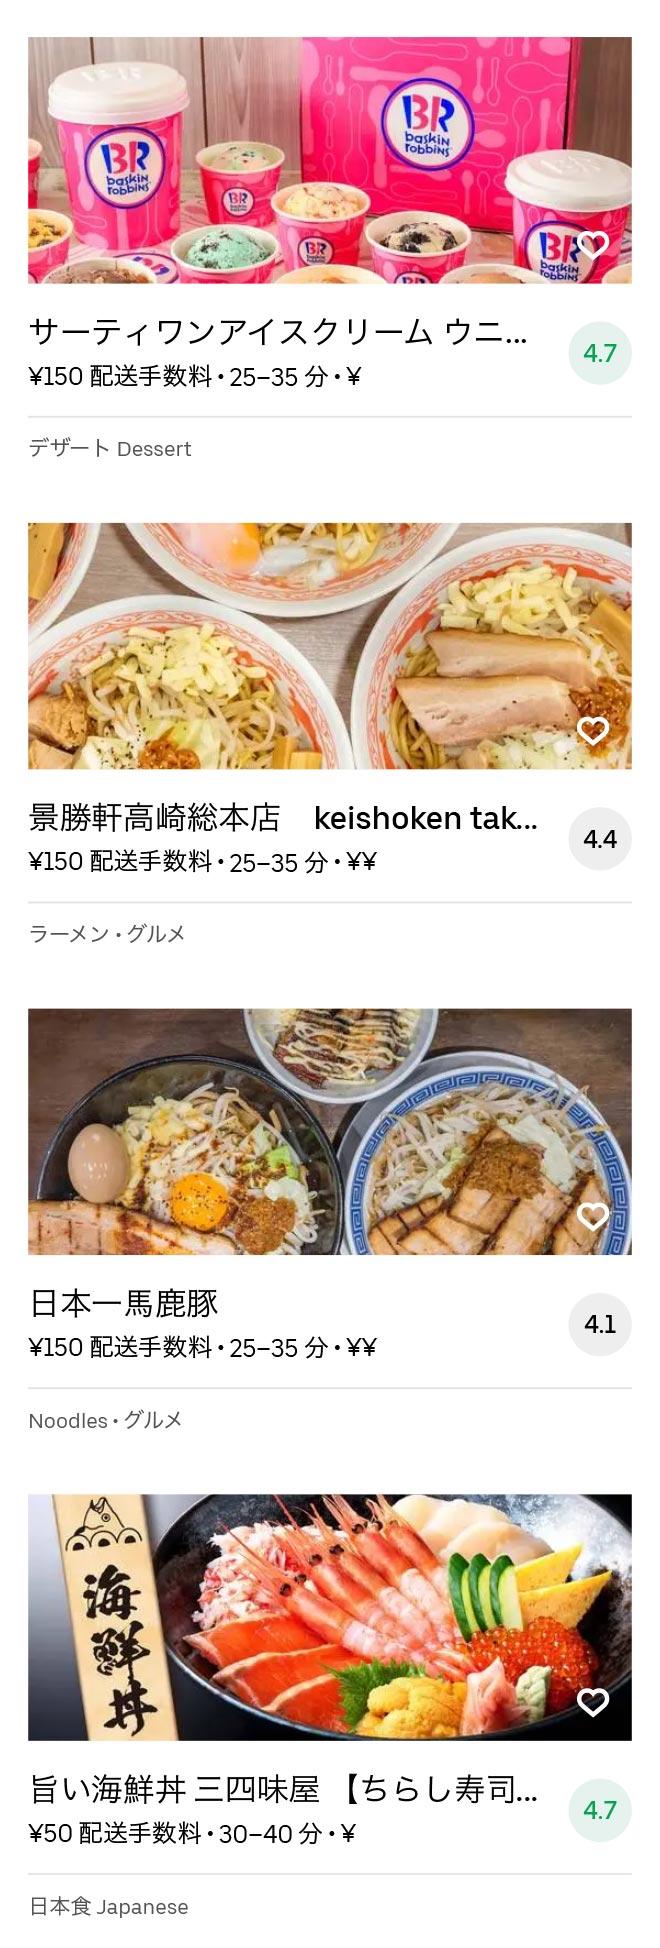 Takasaki menu 2010 08